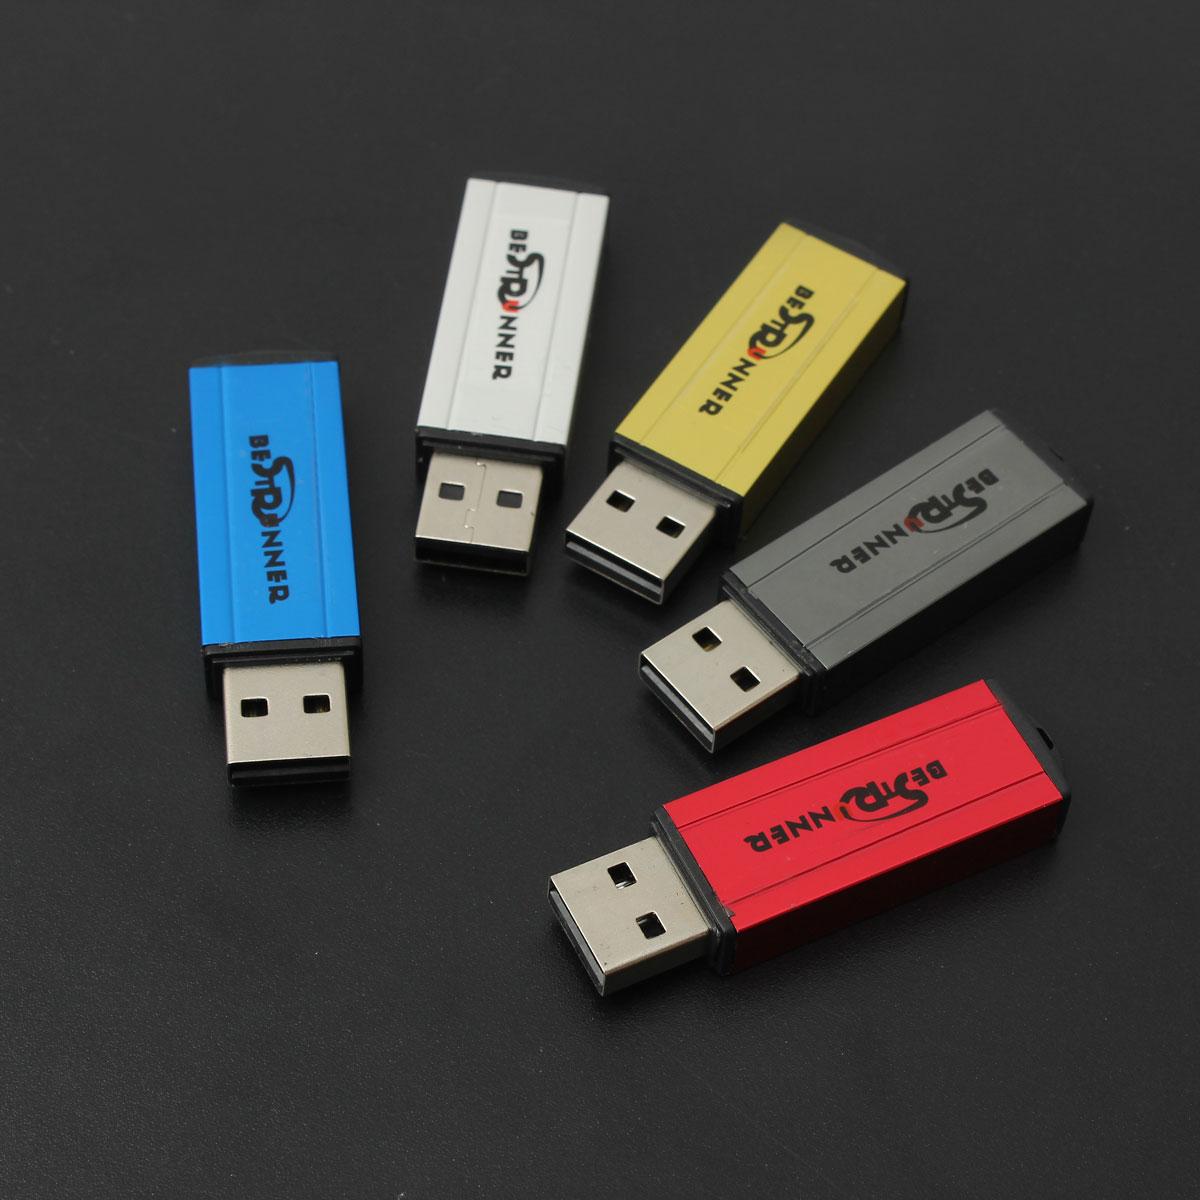 BESTRUNNER 32GB Square Shaped USB 2.0 Flash Drive Stick Memory Thumb Pen Storage U-Disk Multi Color